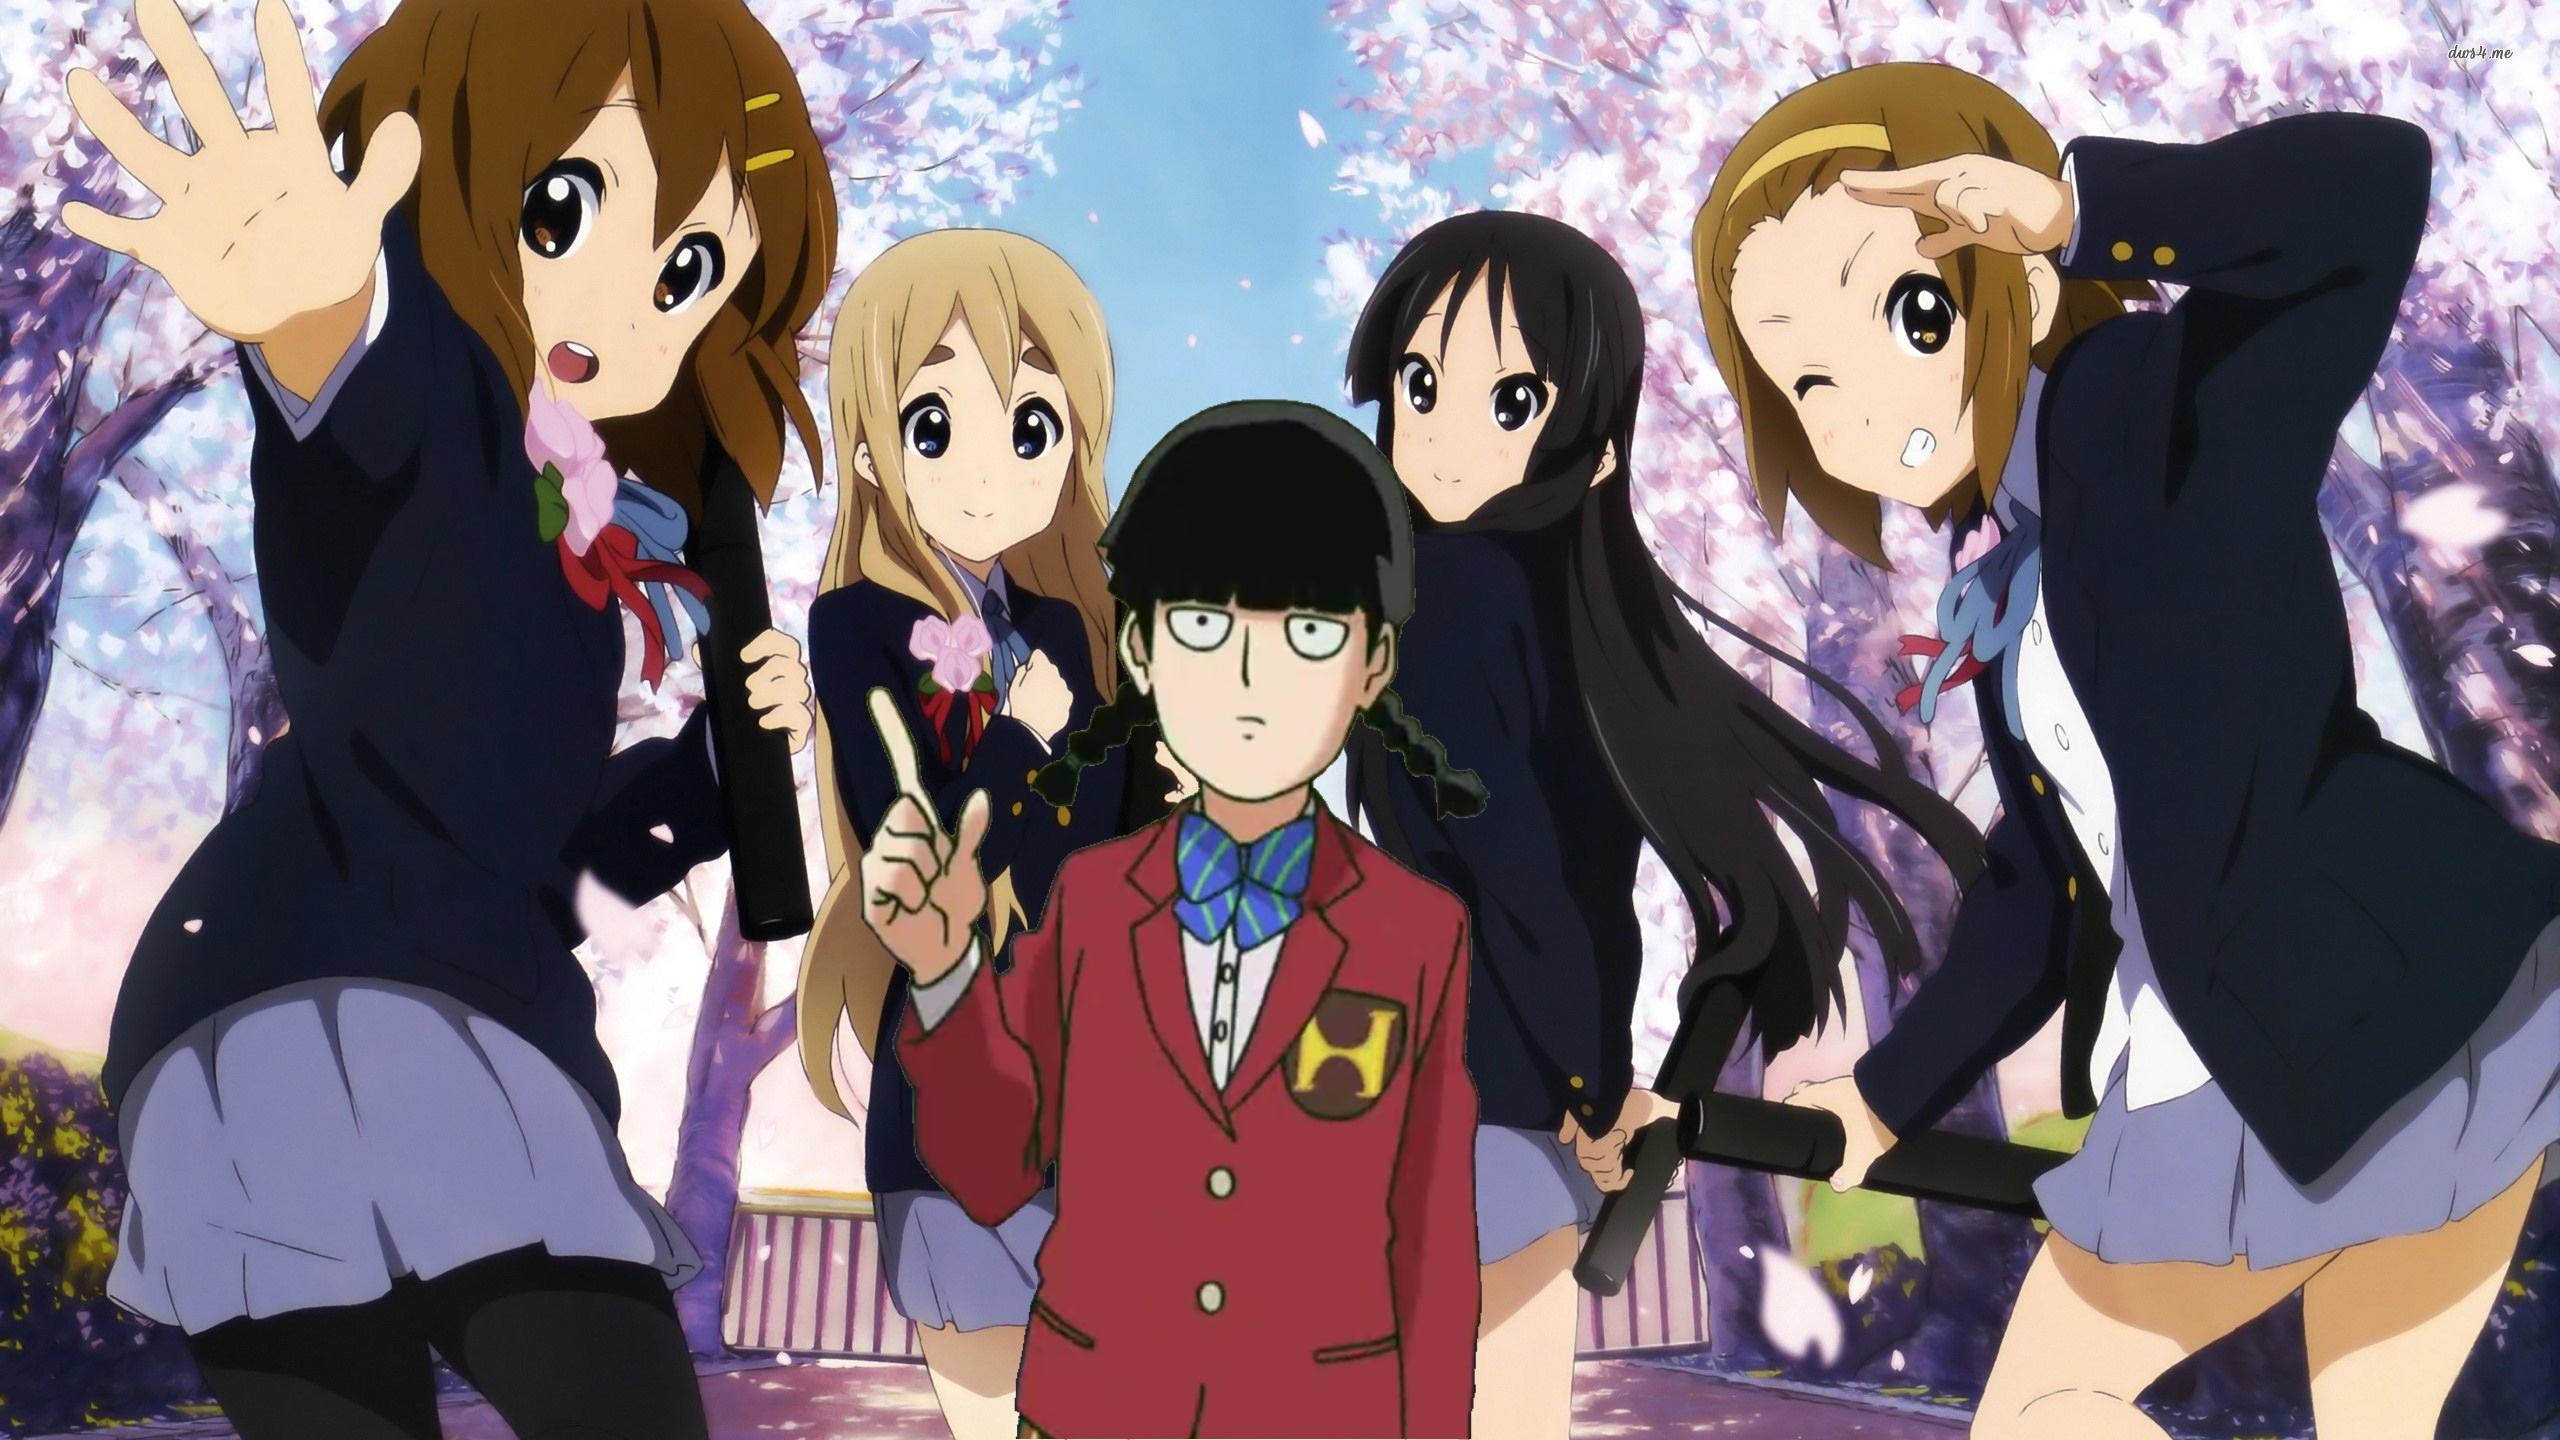 Anime crossdress List of